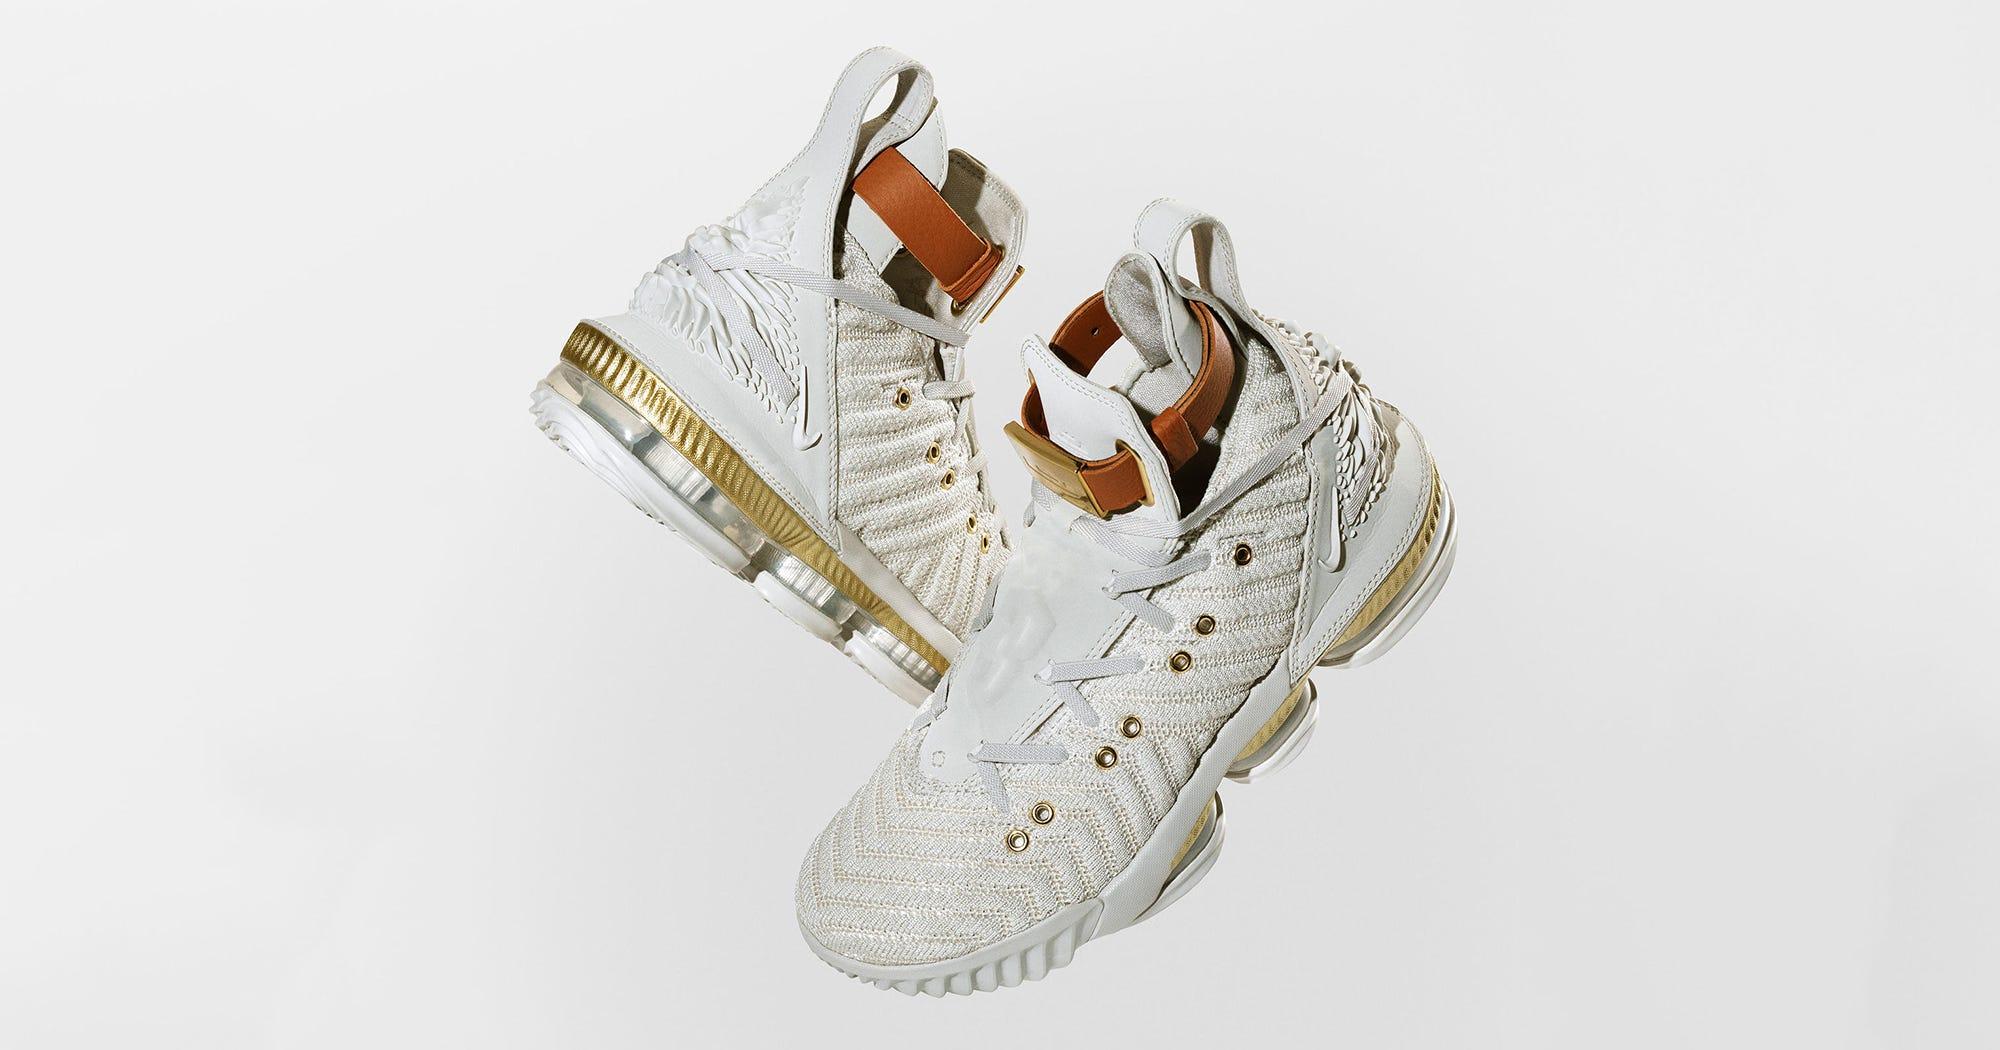 LeBron James First Female Designed Sneaker